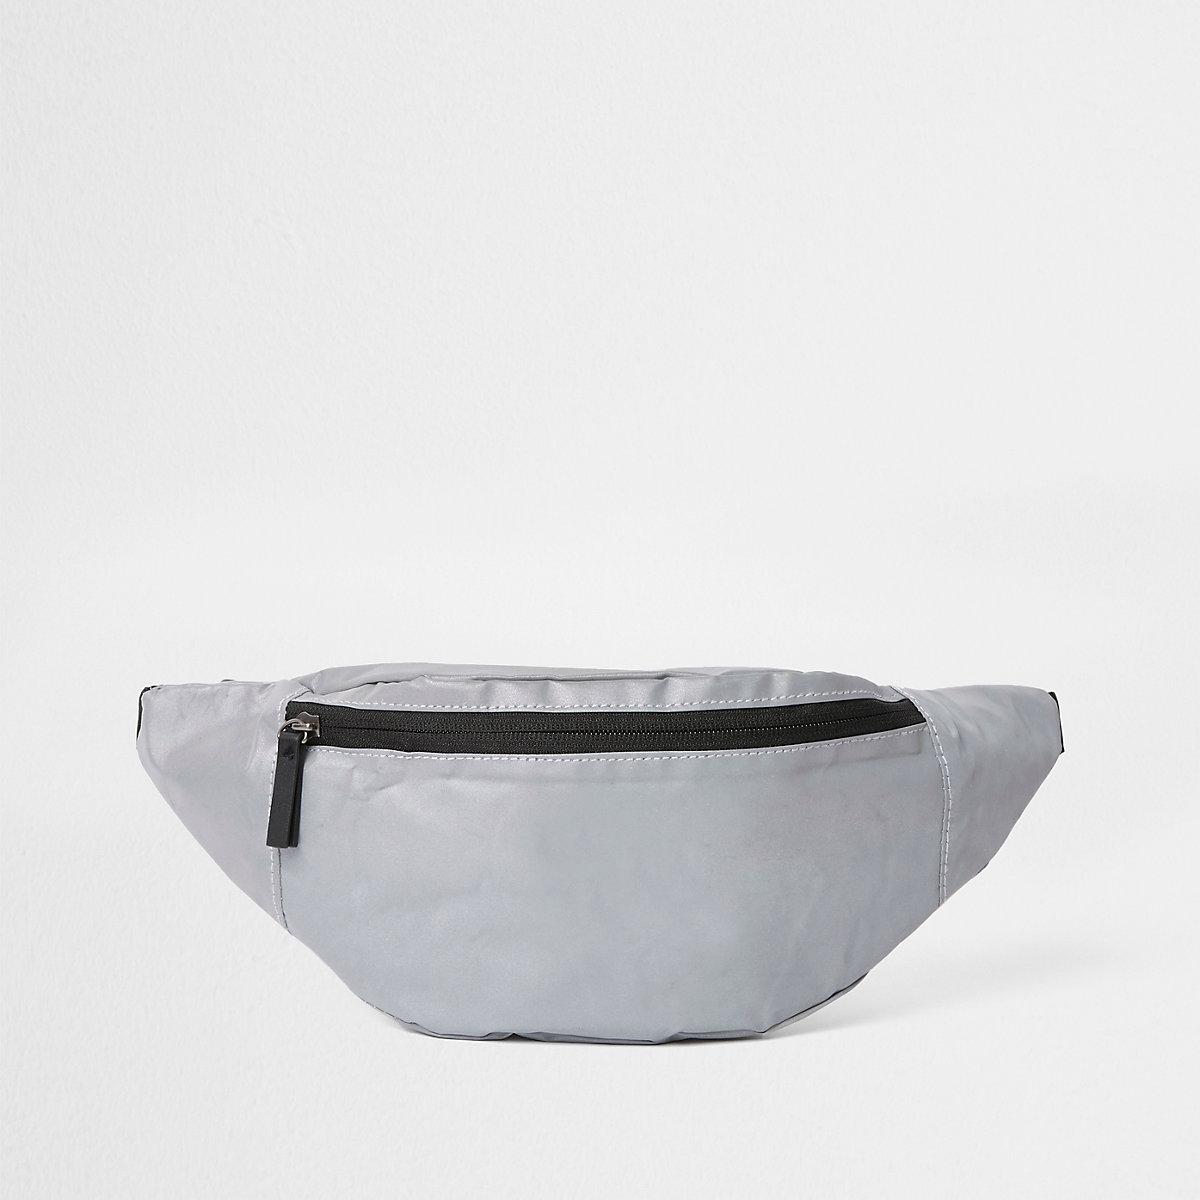 Grey reflective cross body bag